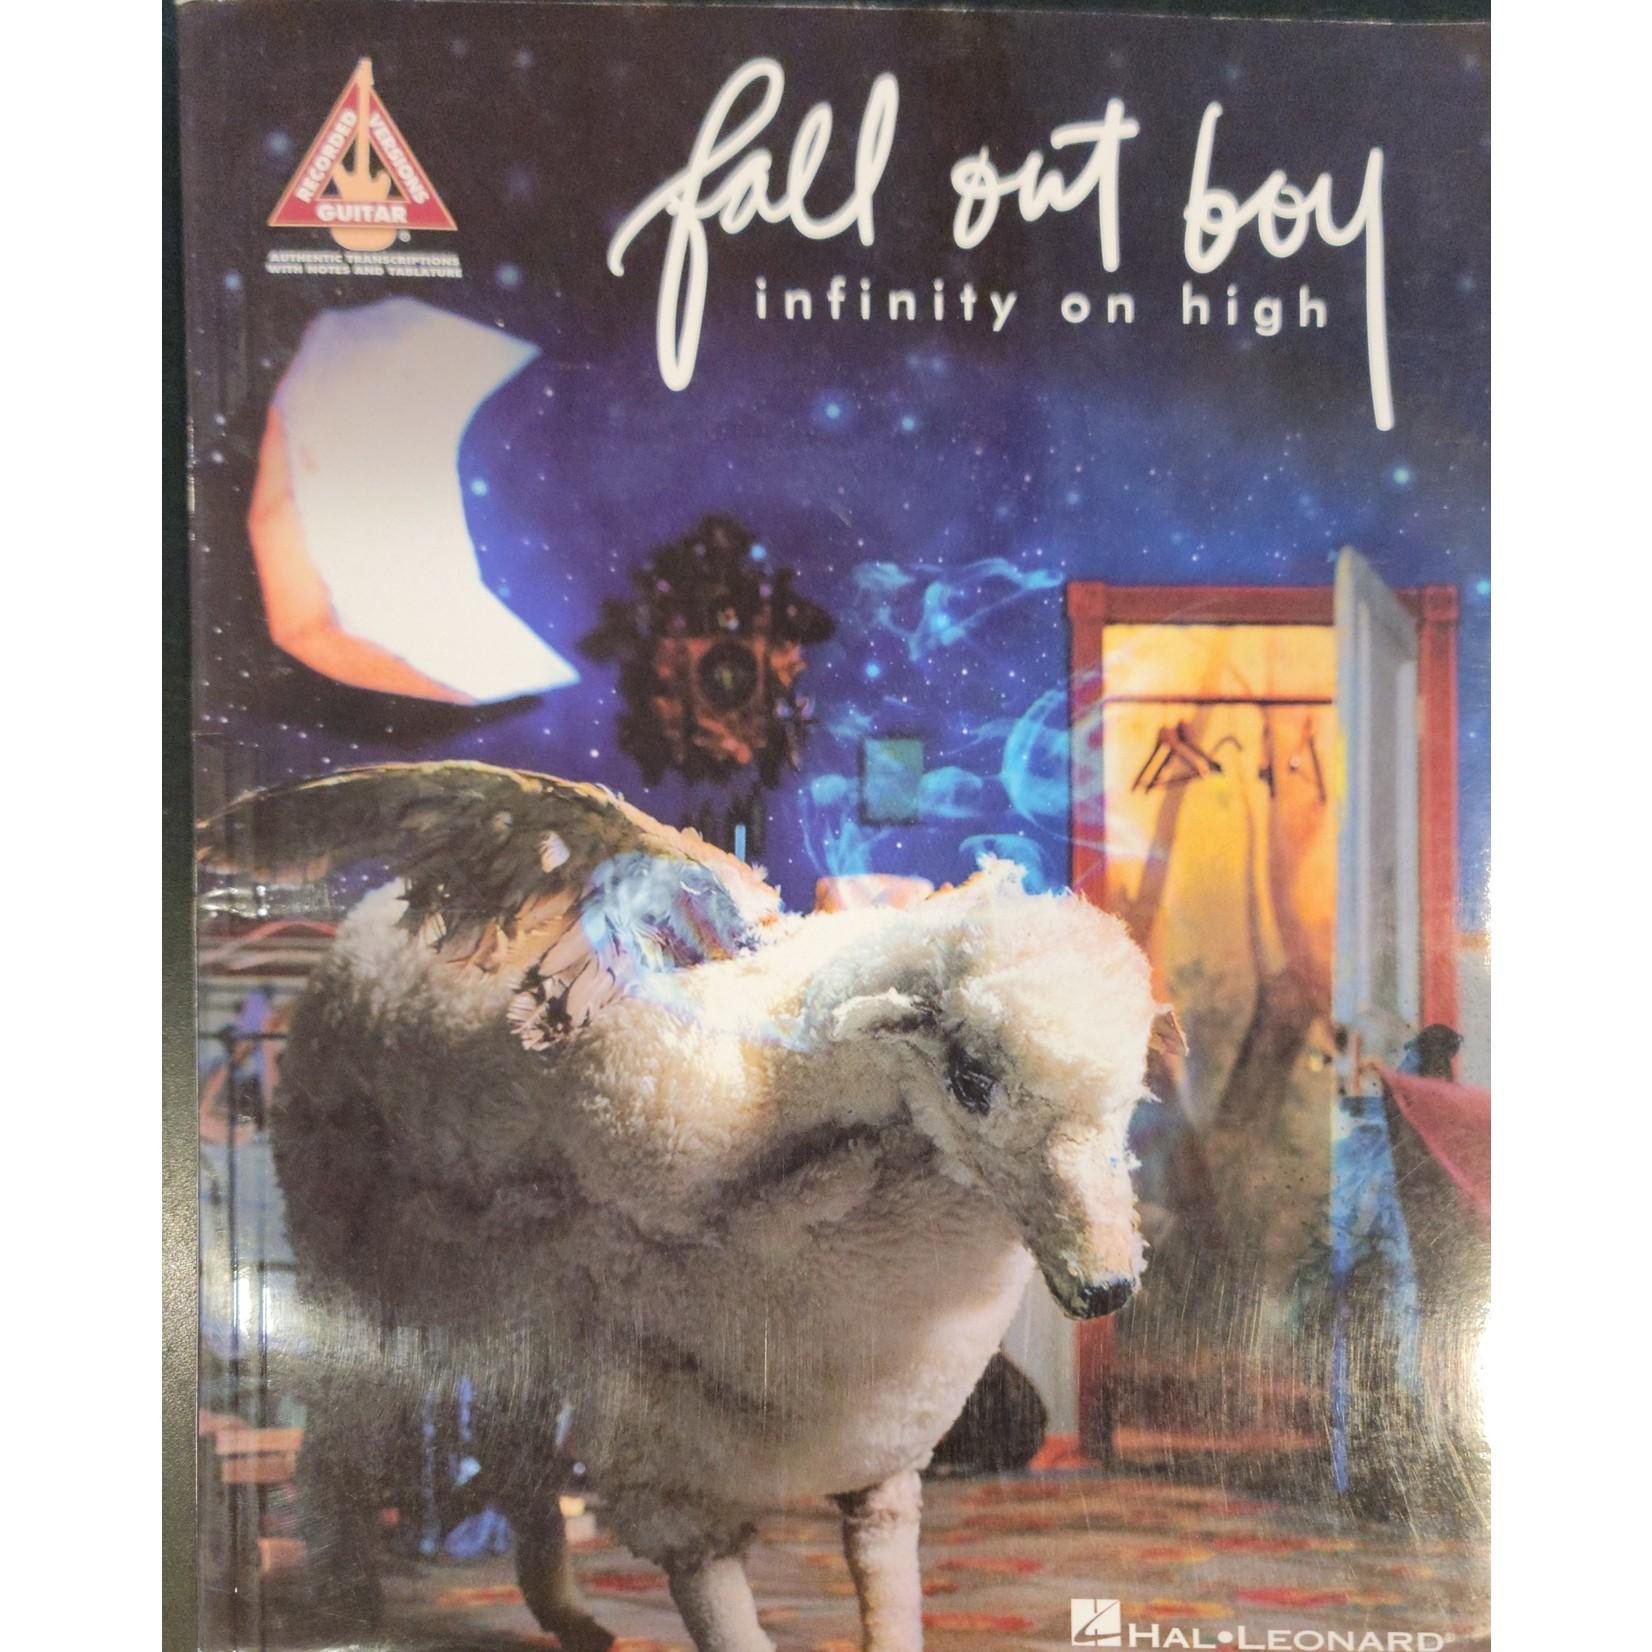 HAL LEONARD LIVRE INFINITY ON HIGH/FALL OUT BOY